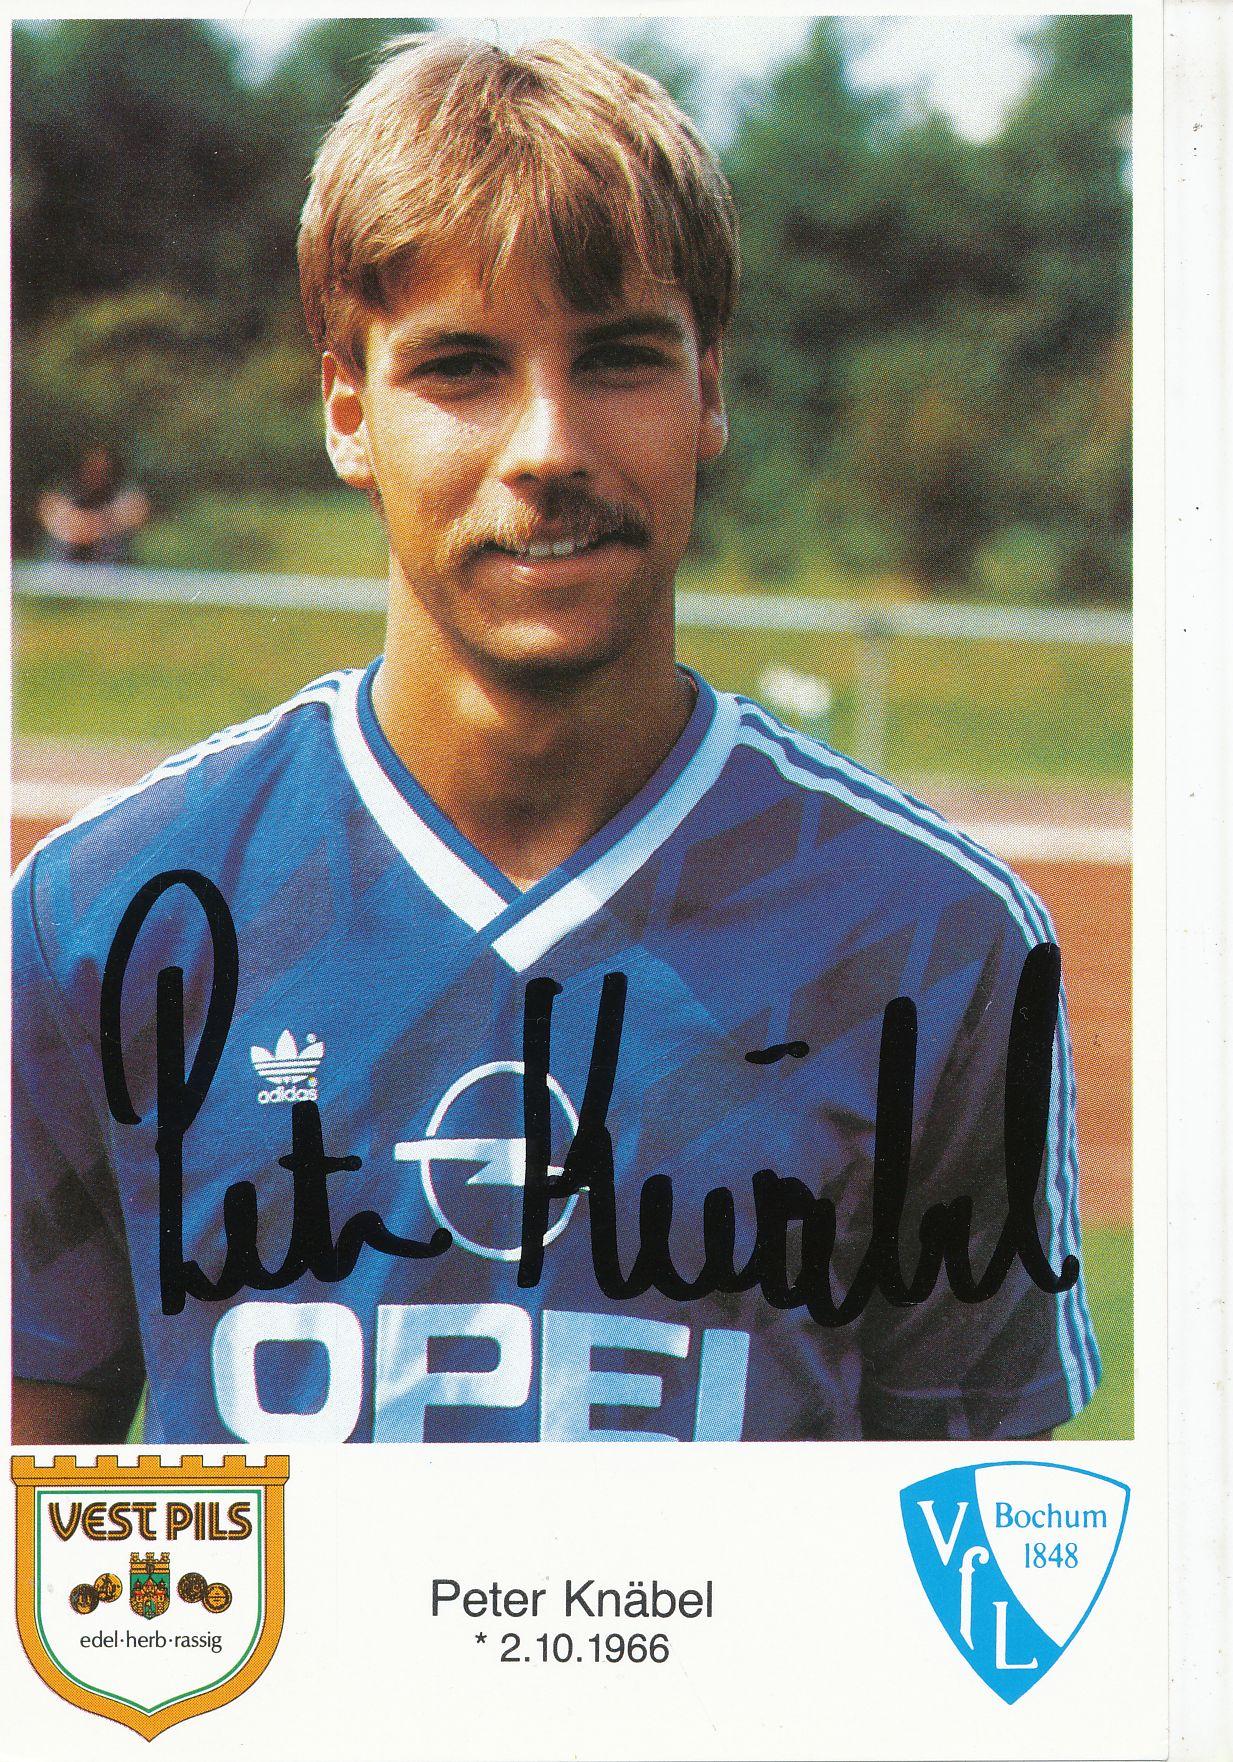 Peter Knäbel Autogrammkarte VFL Bochum 1985-86 Original Signiert A 195065